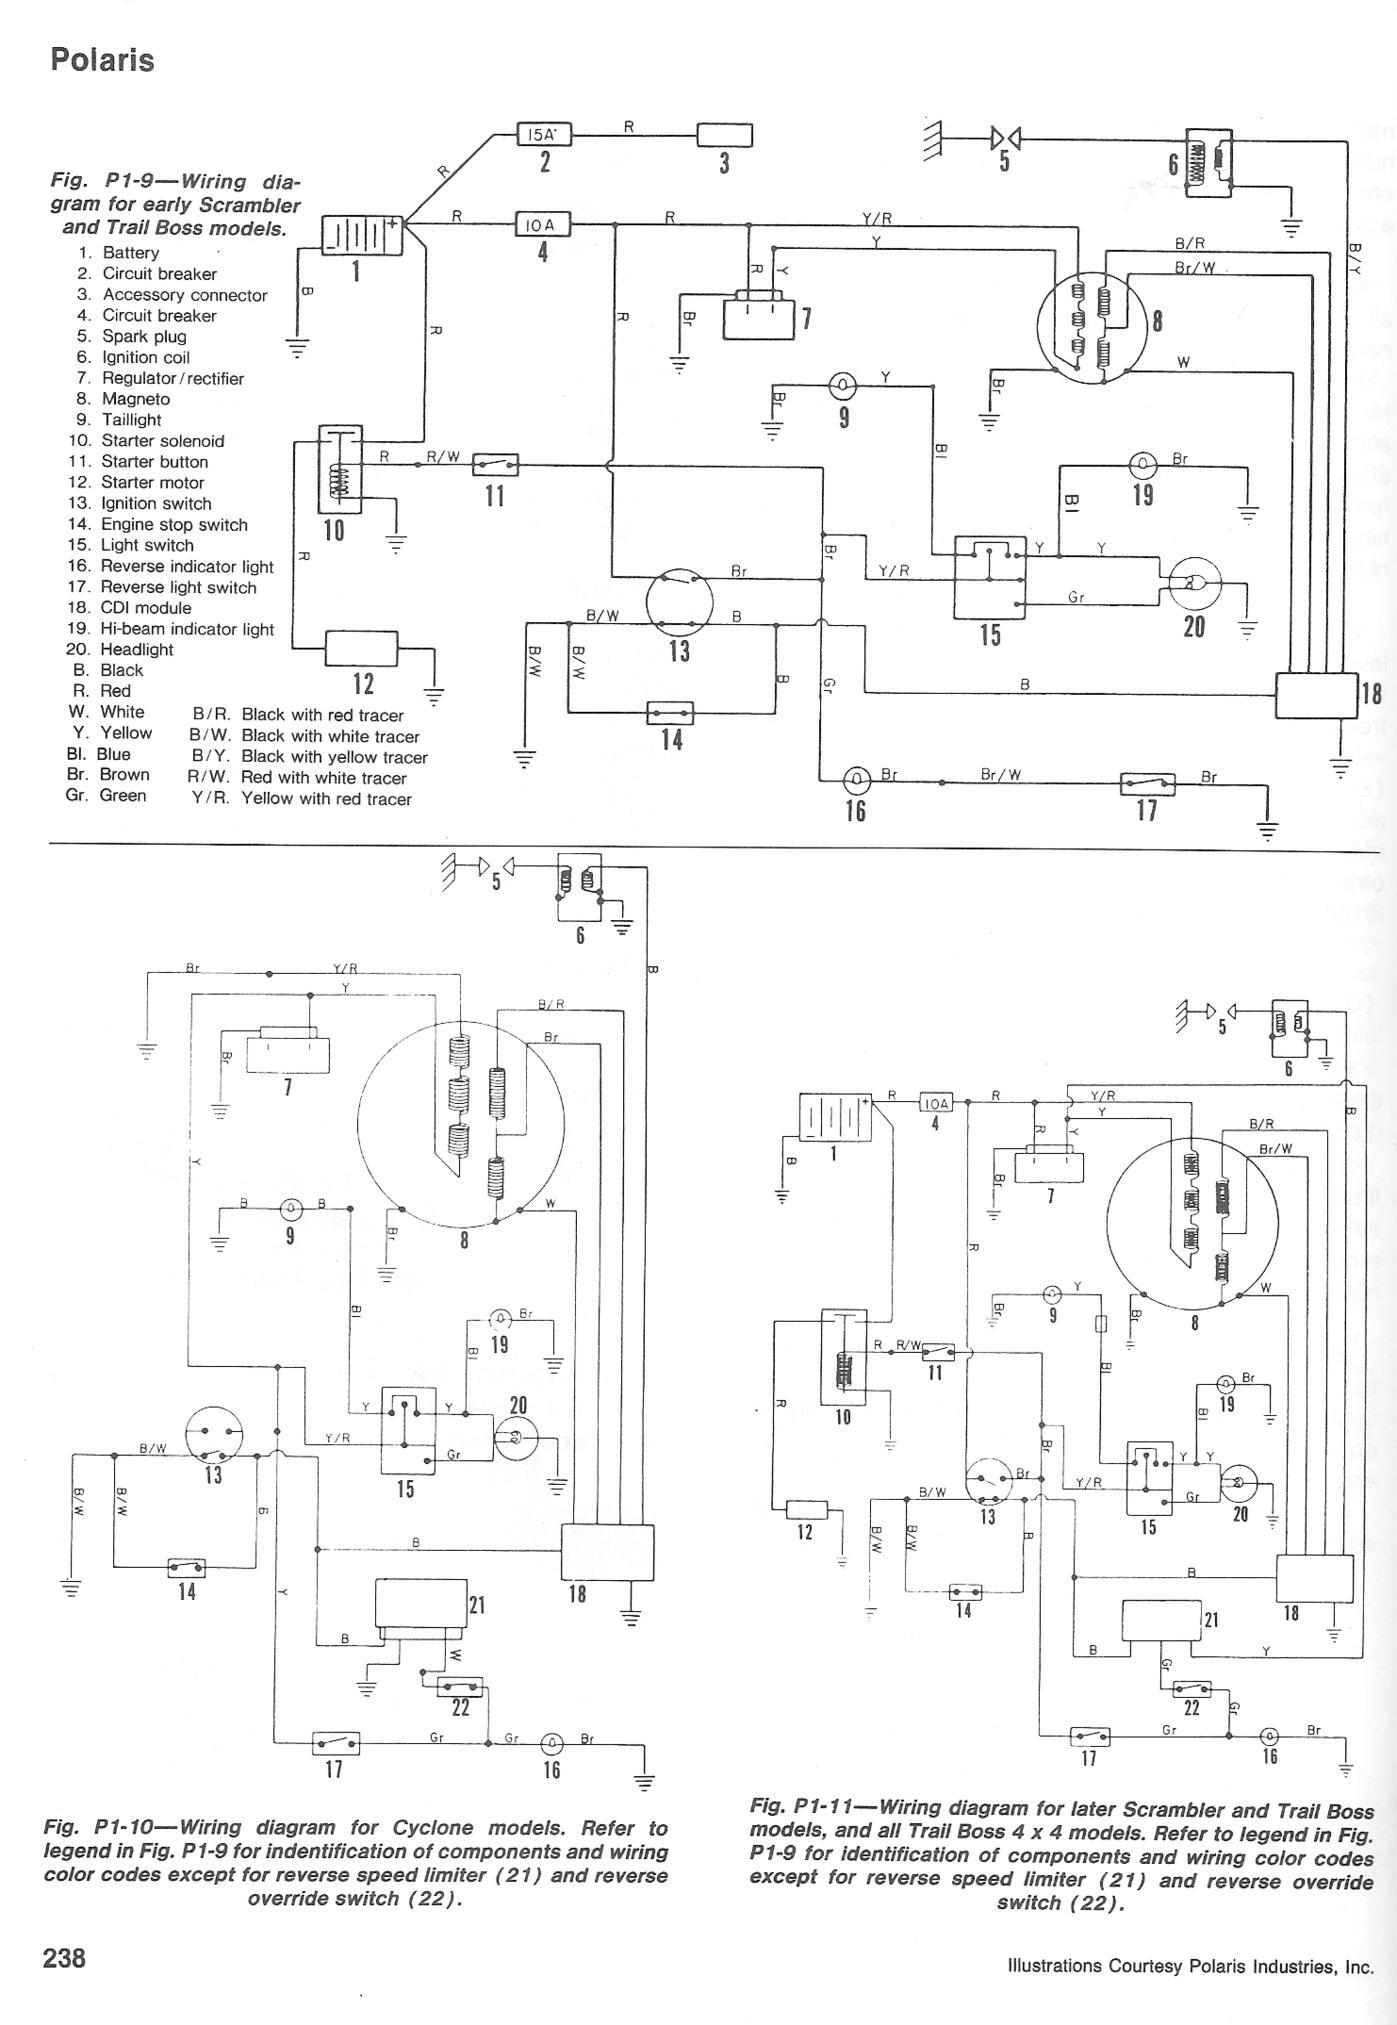 wb_5540] 2004 polaris sportsman 600 wiring diagram  expe impa props redne socad cajos inrebe proe numdin hete neph sarc bedr  cette mohammedshrine librar wiring 101